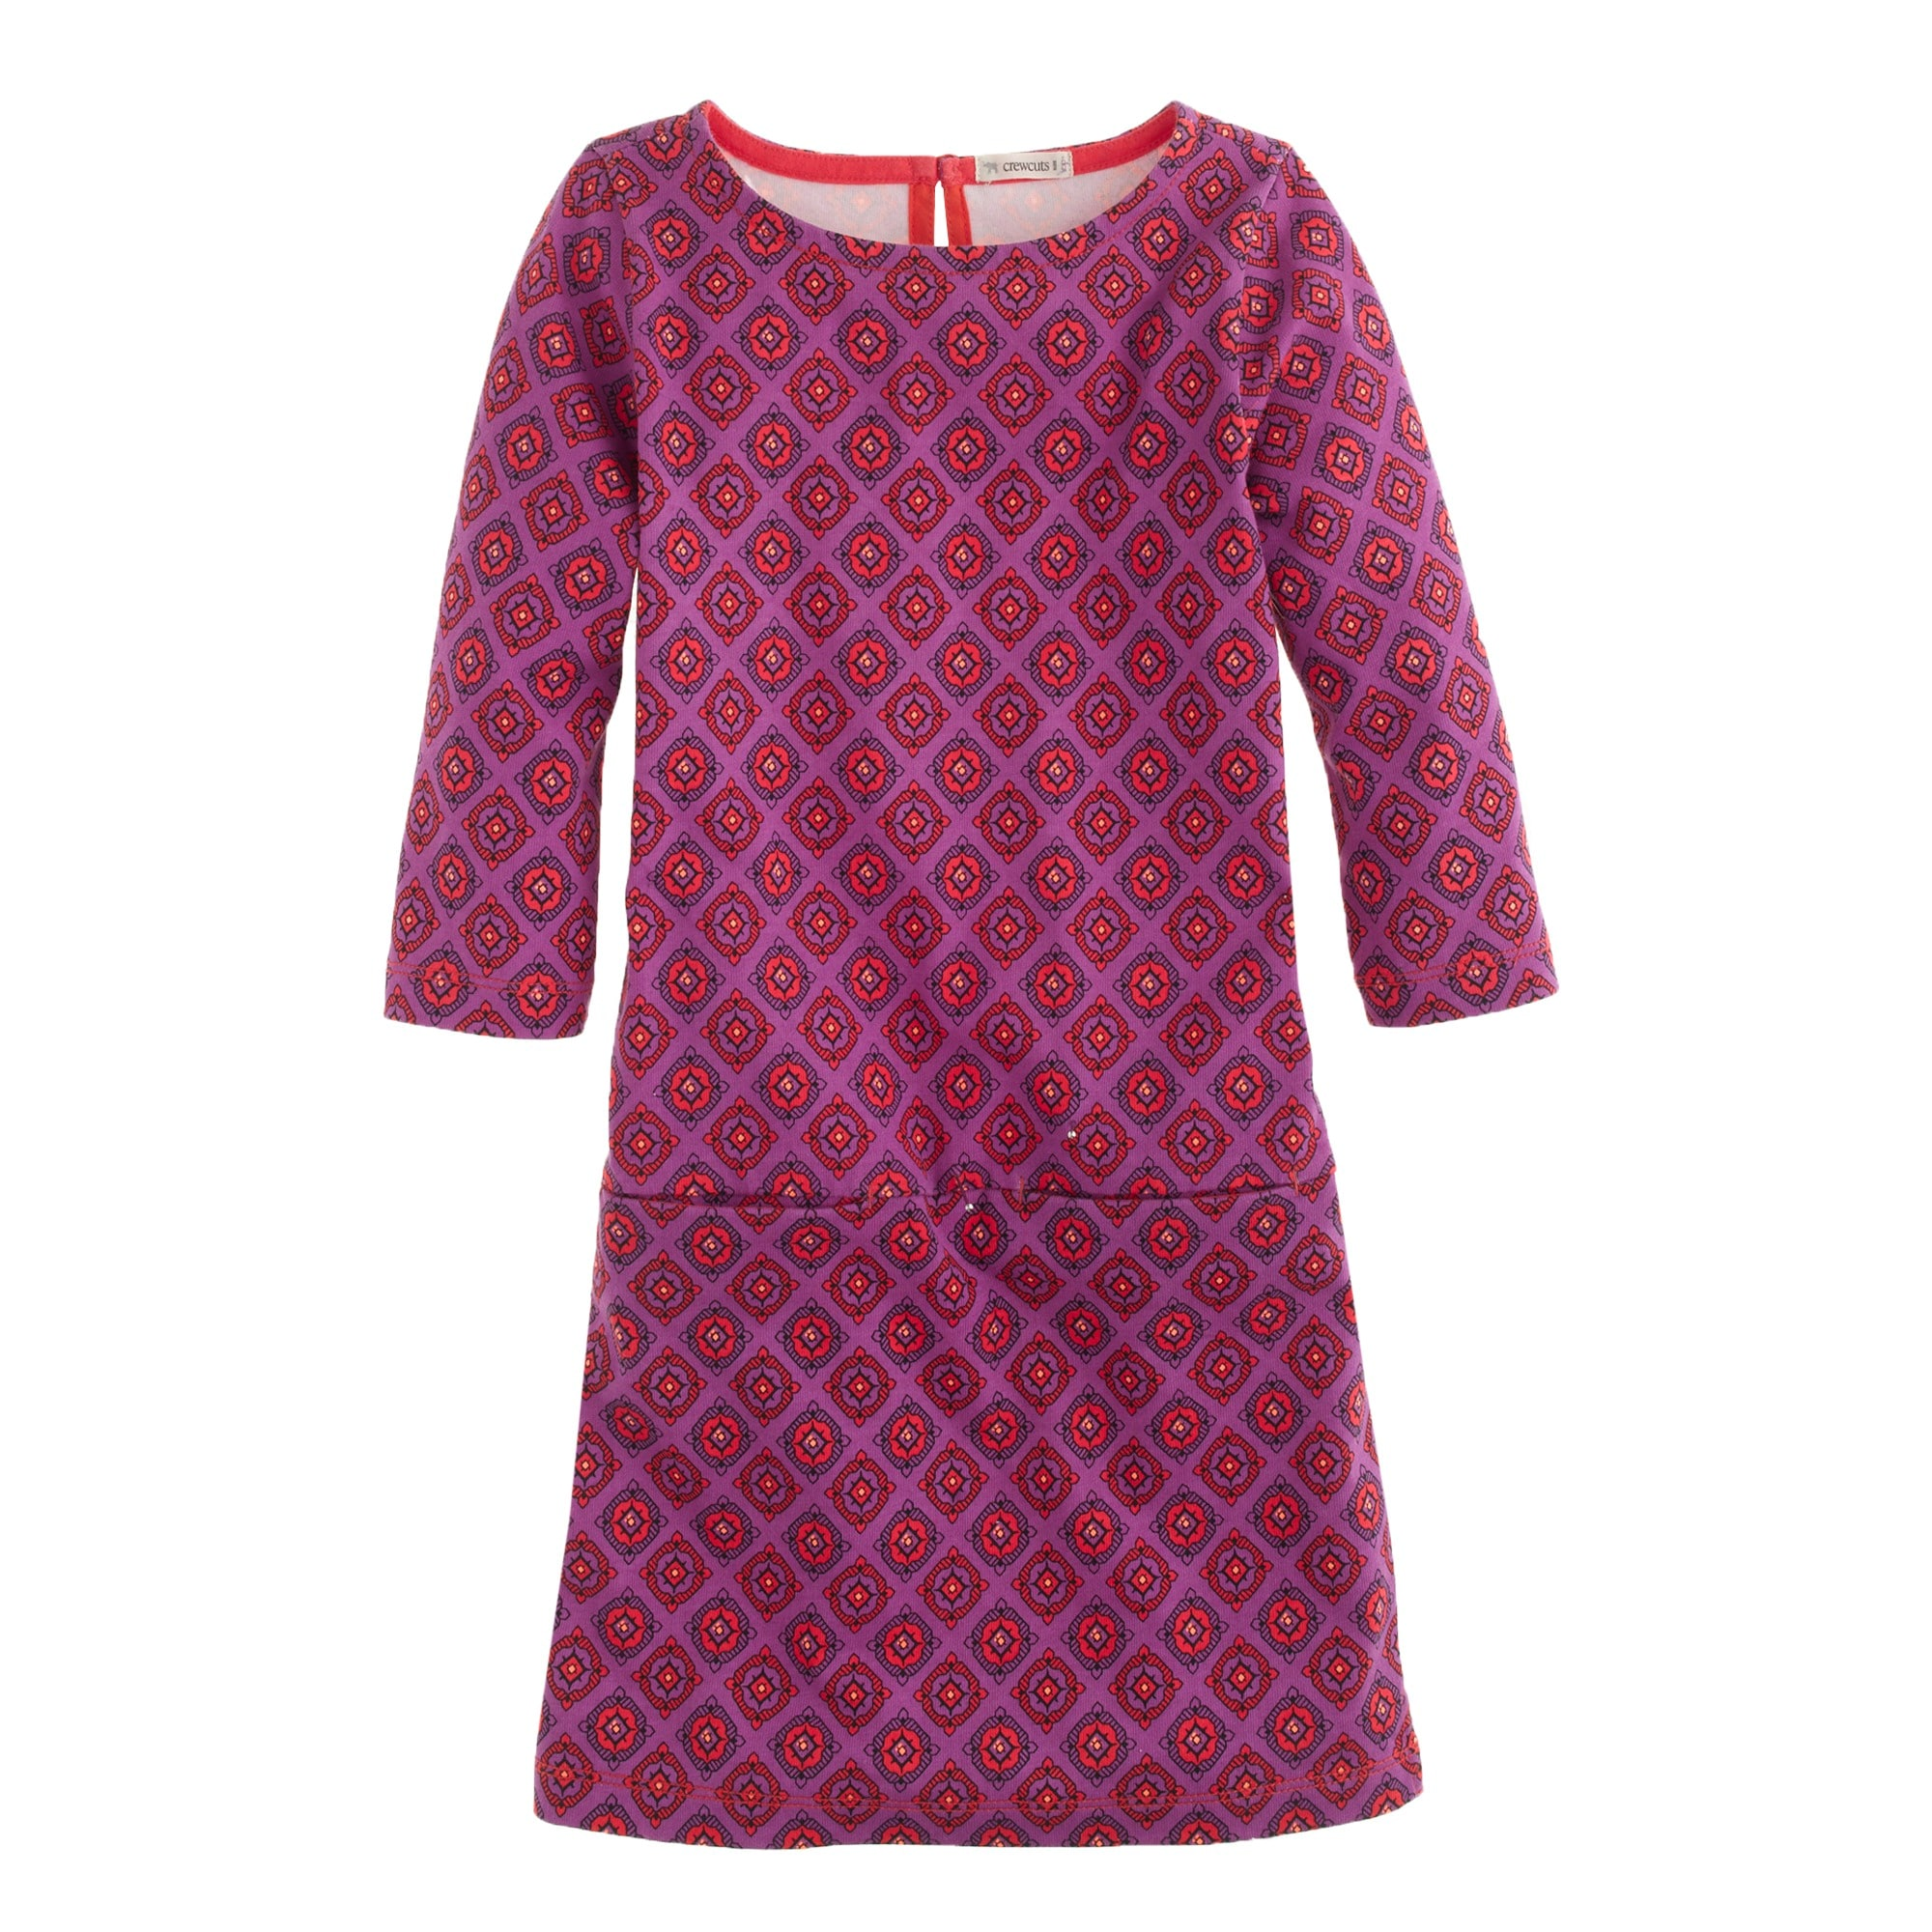 girls' jules dress in bright fuchsia foulard :